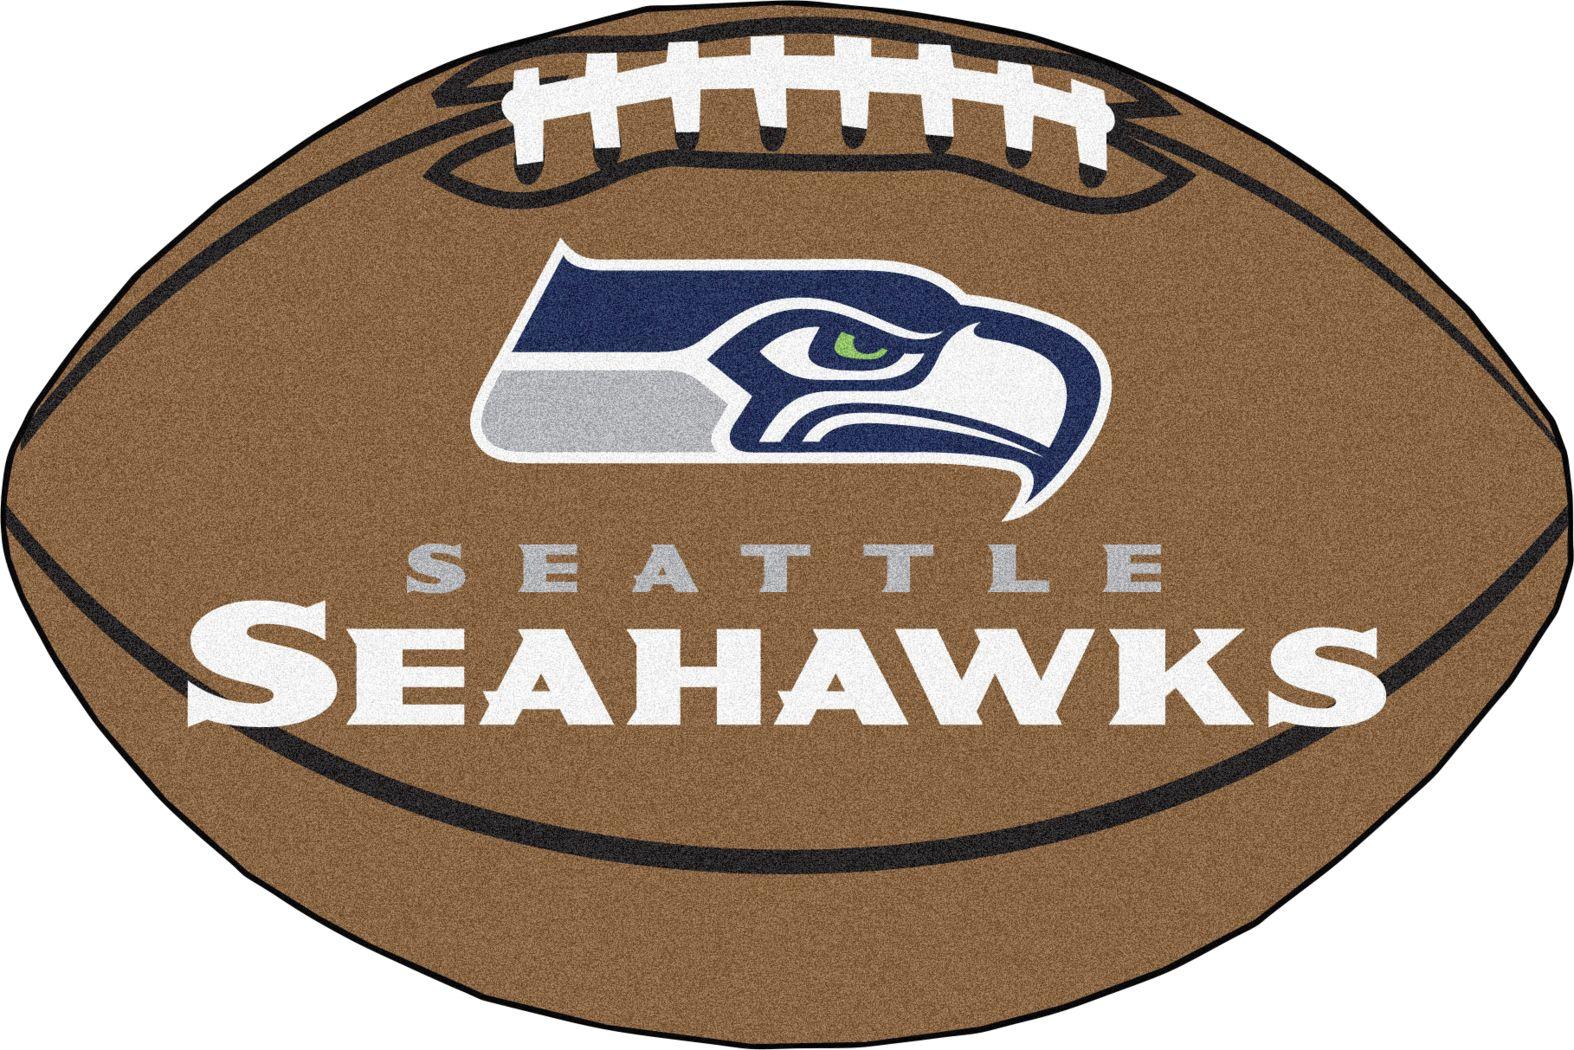 "NFL Football Mascot Seattle Seahawks 1'6"" x 1'10"" Rug"